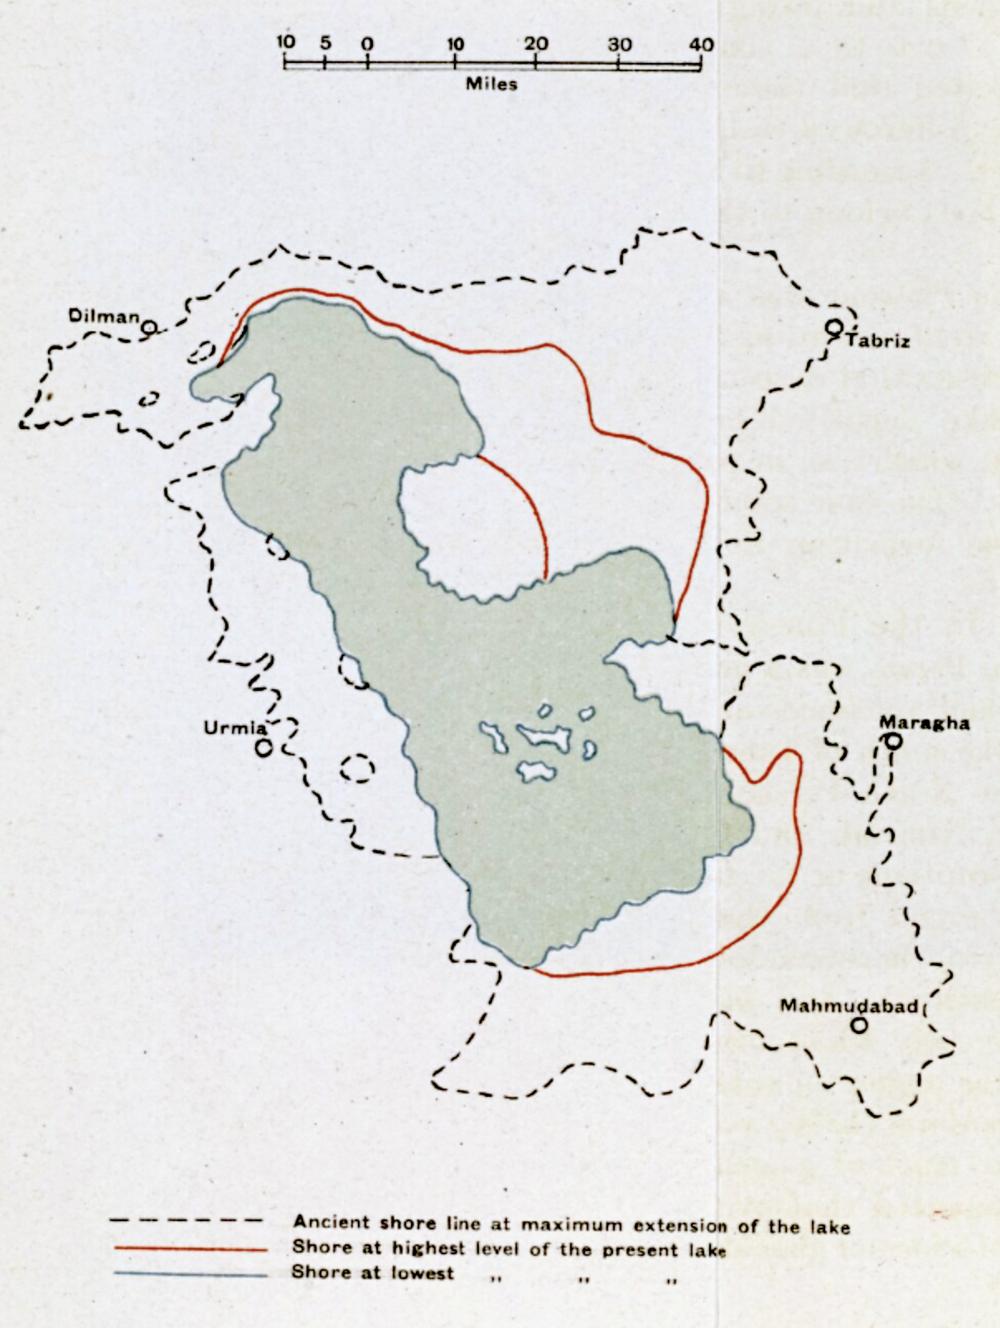 Ei britisk geologisk oversikt viser Urmia-sjøen sine dimensjonar slik ein trudde den var i mai 1918 ('Fig. 6 The Former Extension of Lake Urmia (after de Morgan)'IOR/L/MIL/17/15/54, p 46A)